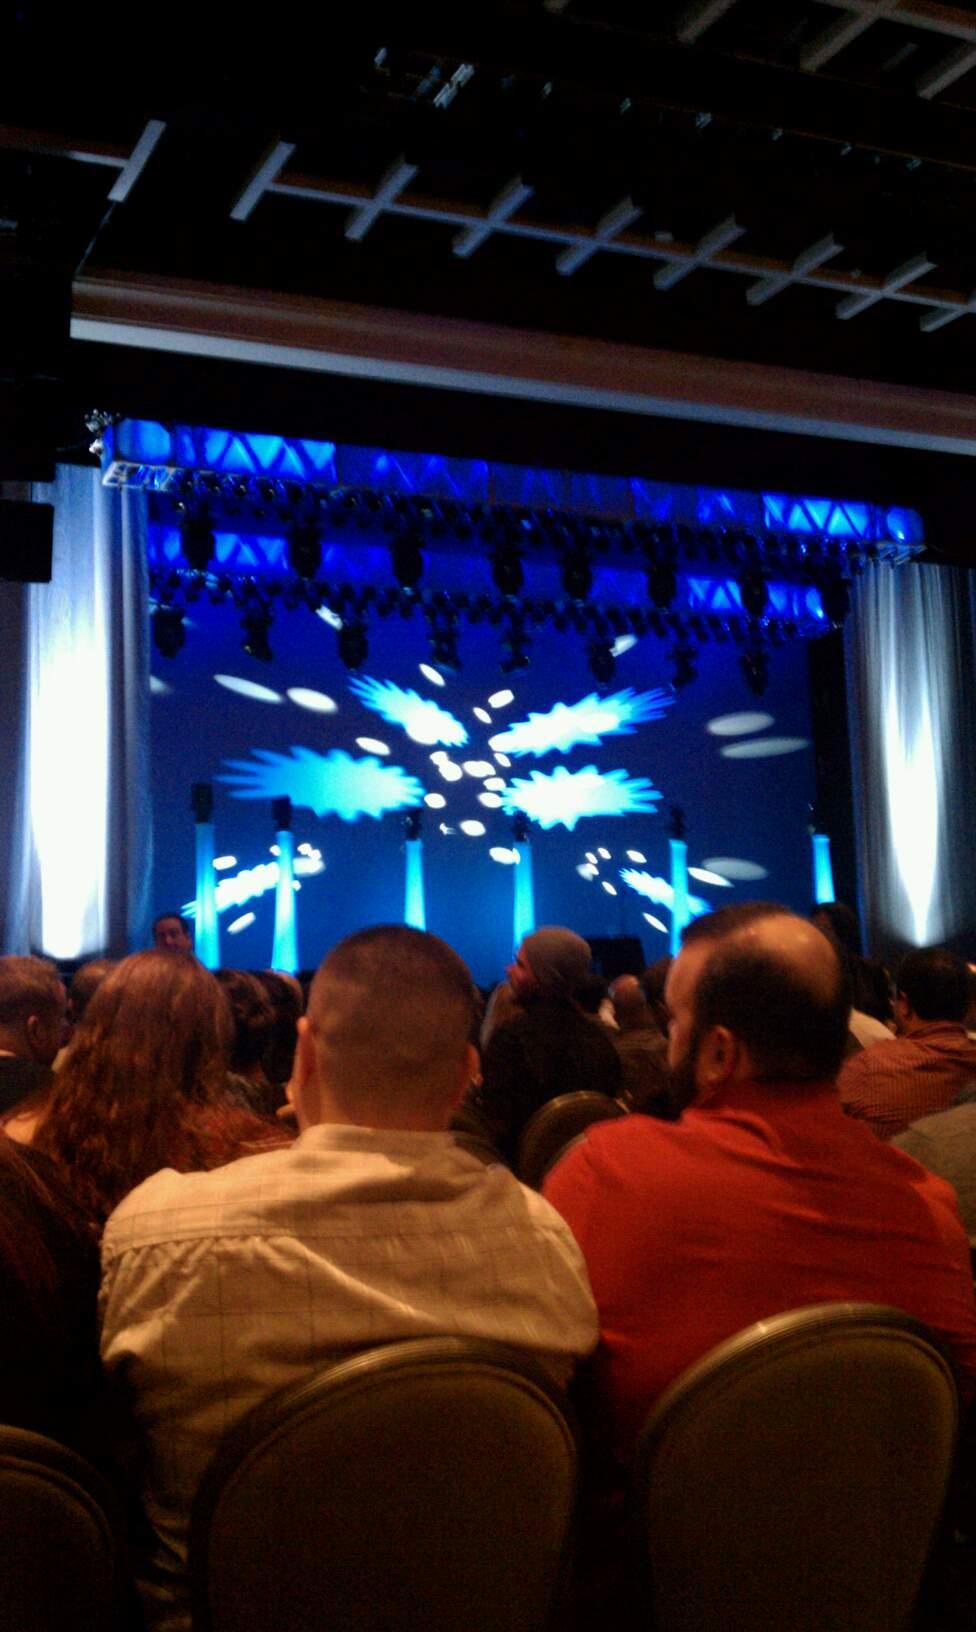 Borgata Event Center Section 200 Row 18 Seat 2